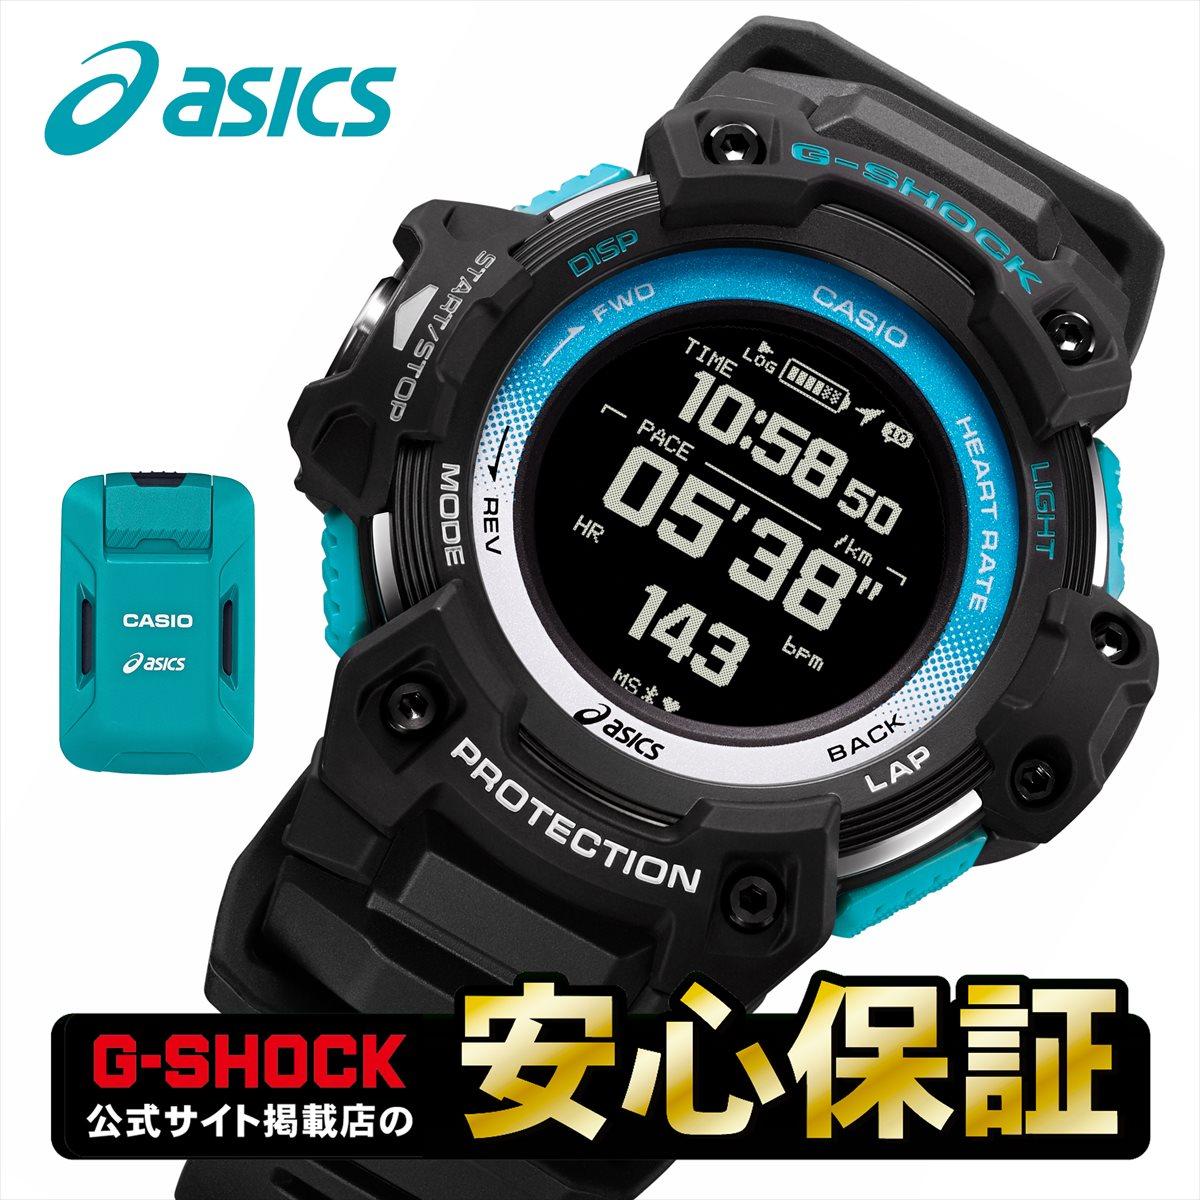 腕時計, メンズ腕時計  G ASICS GSR-H1000AS-SET Runmetrix G-SHOCK CASIO G-SHOCK032110spl